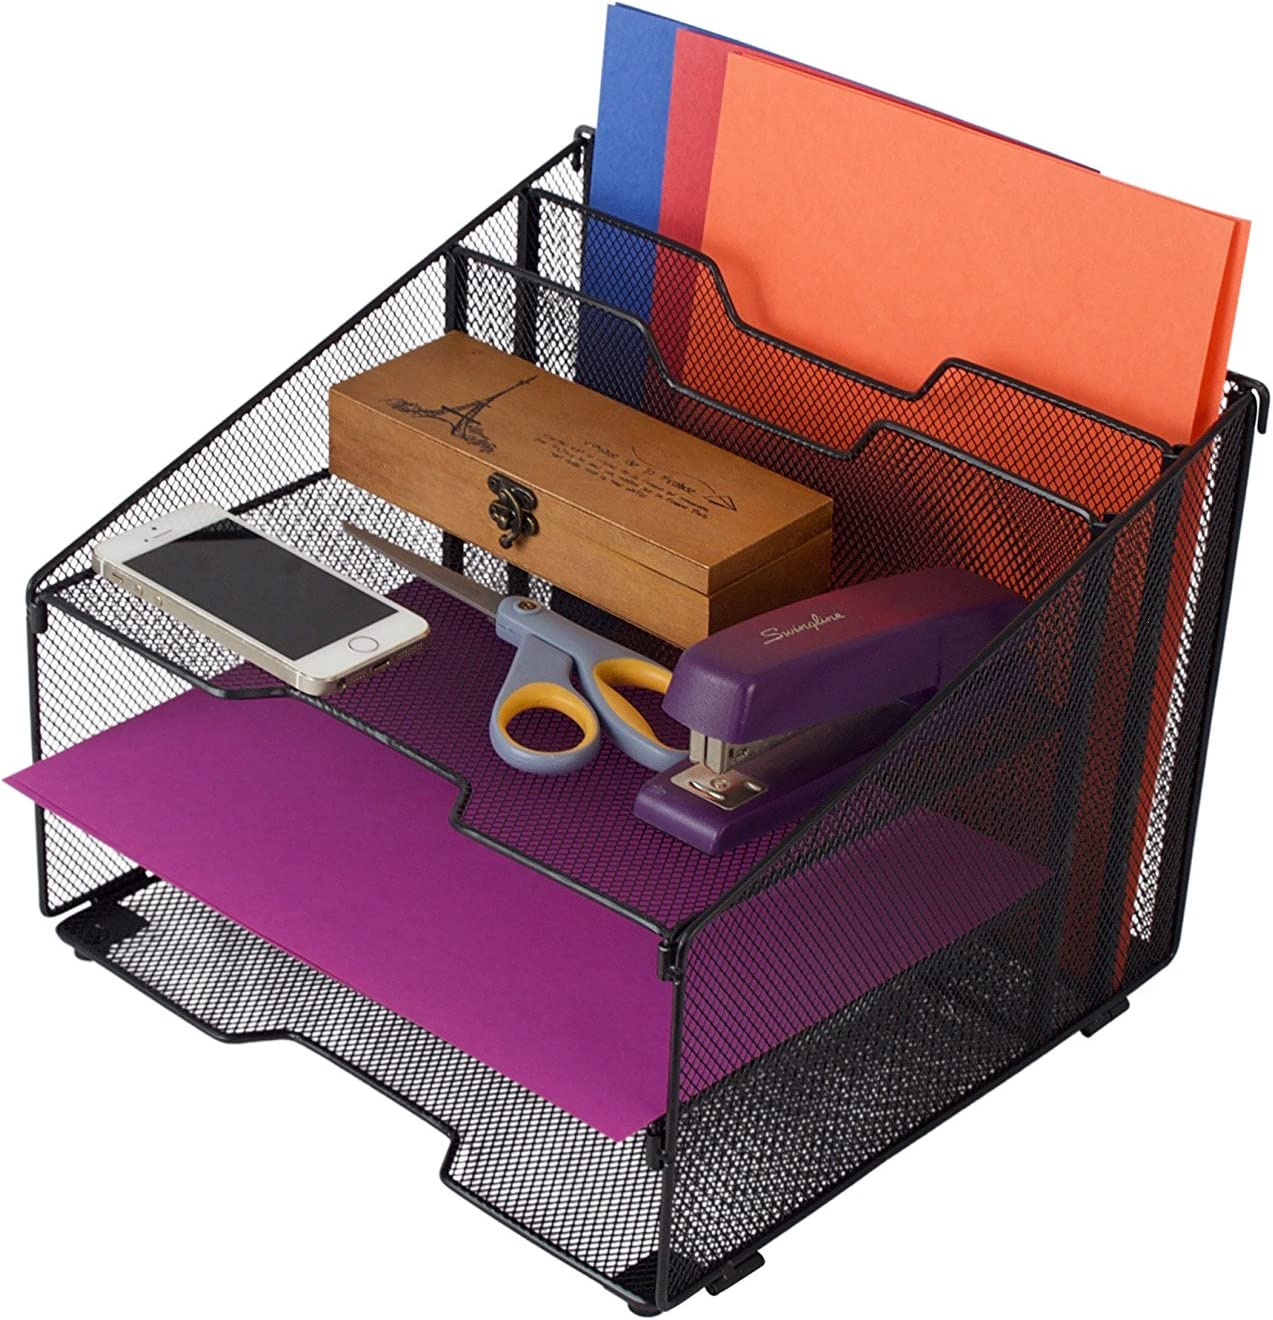 5-Compartment Metal Mesh Desktop File Sorter Desk Tray Organizer Black